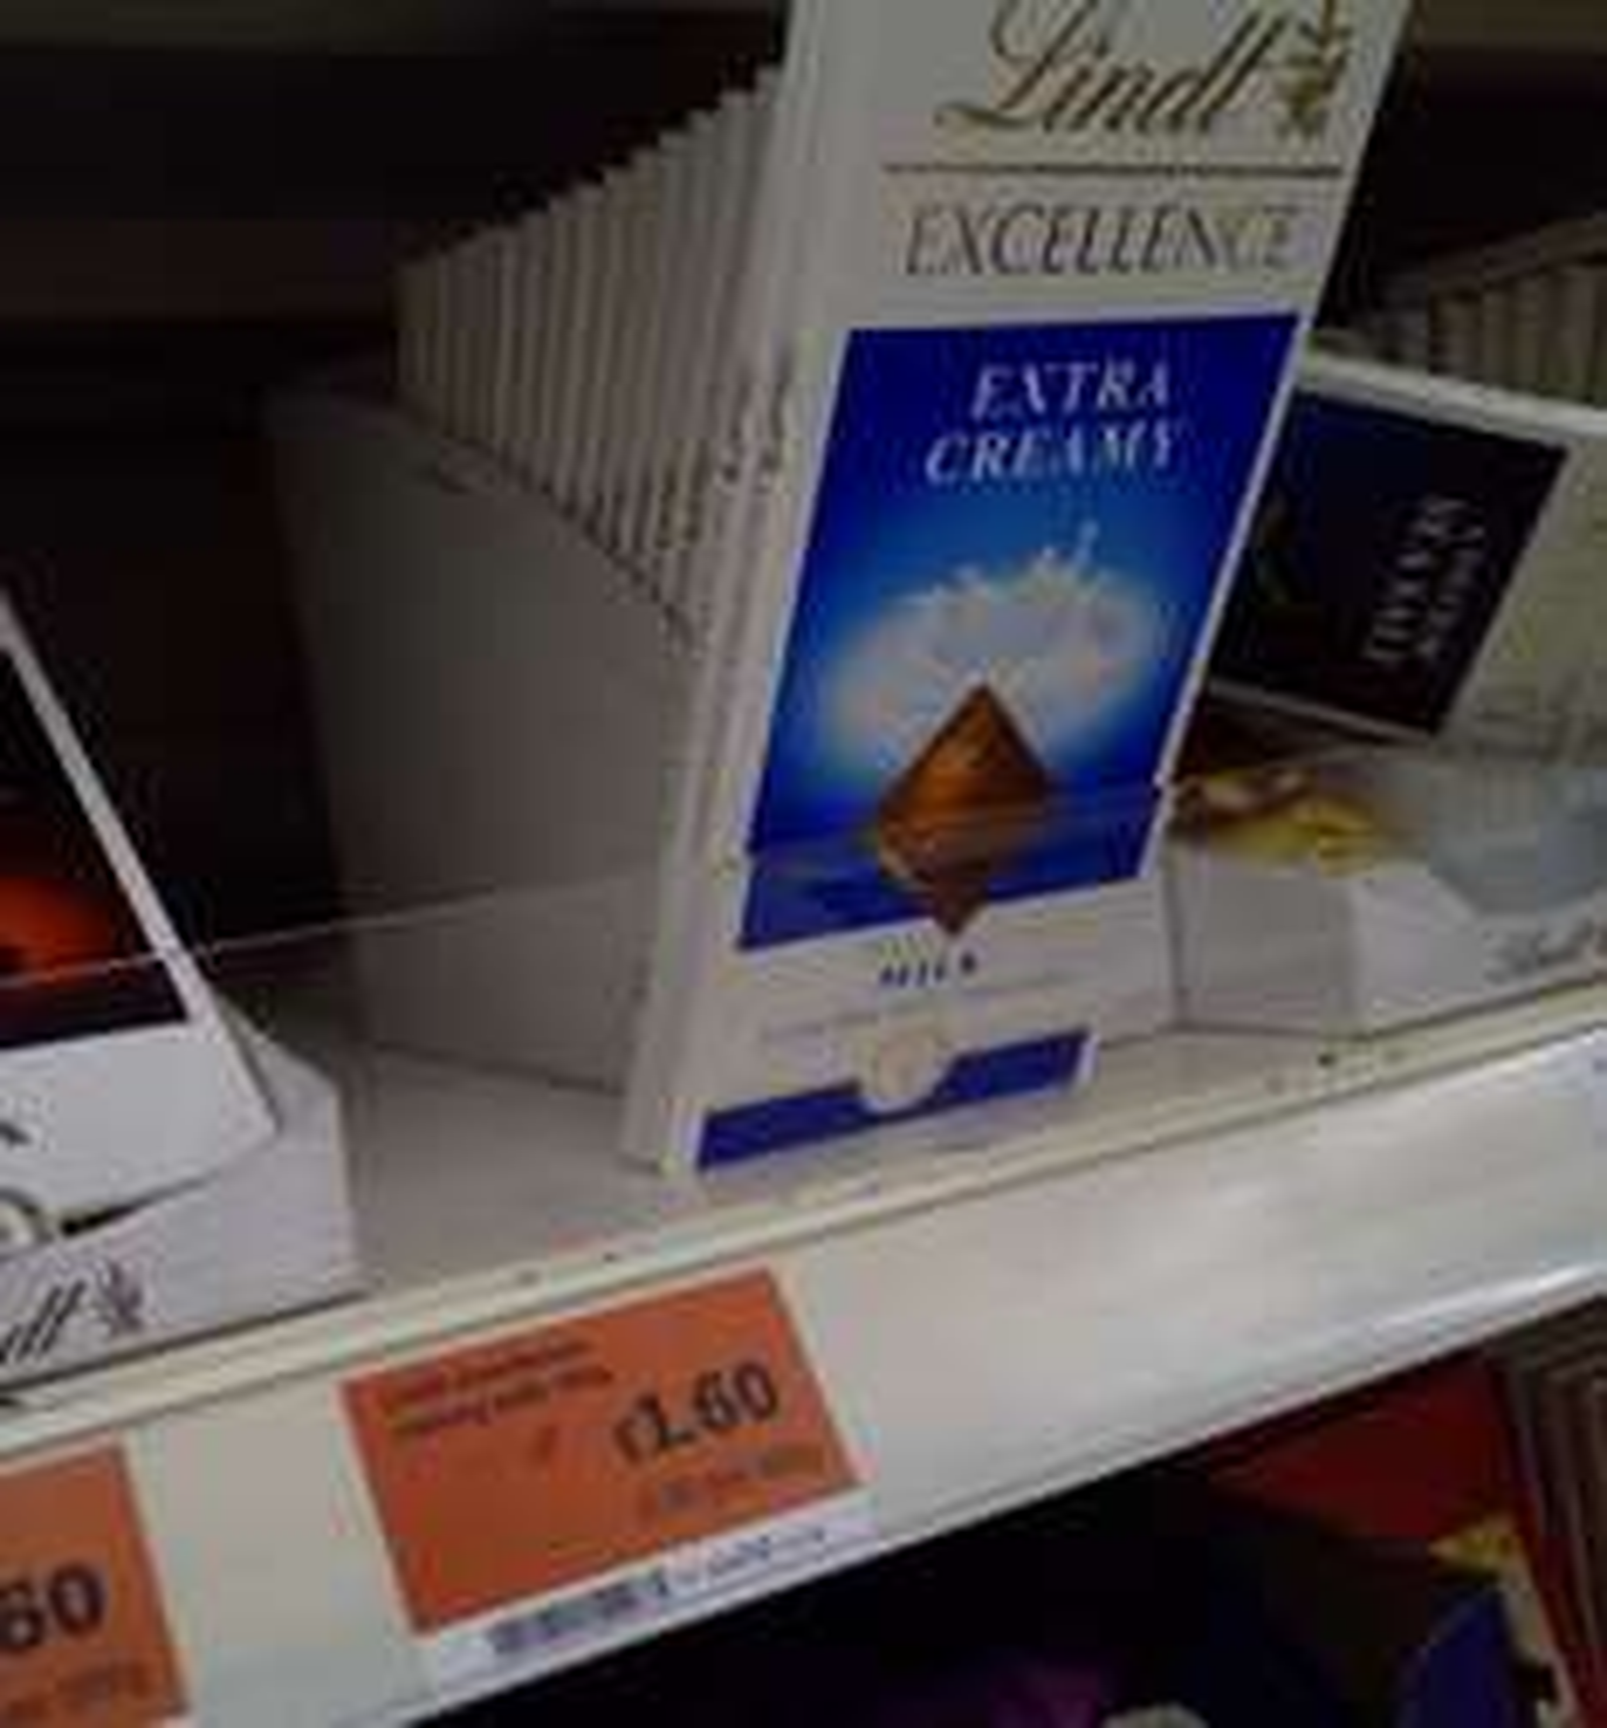 Lindt Extra Creamy Chocolate - £1.60 at Sainsbury's